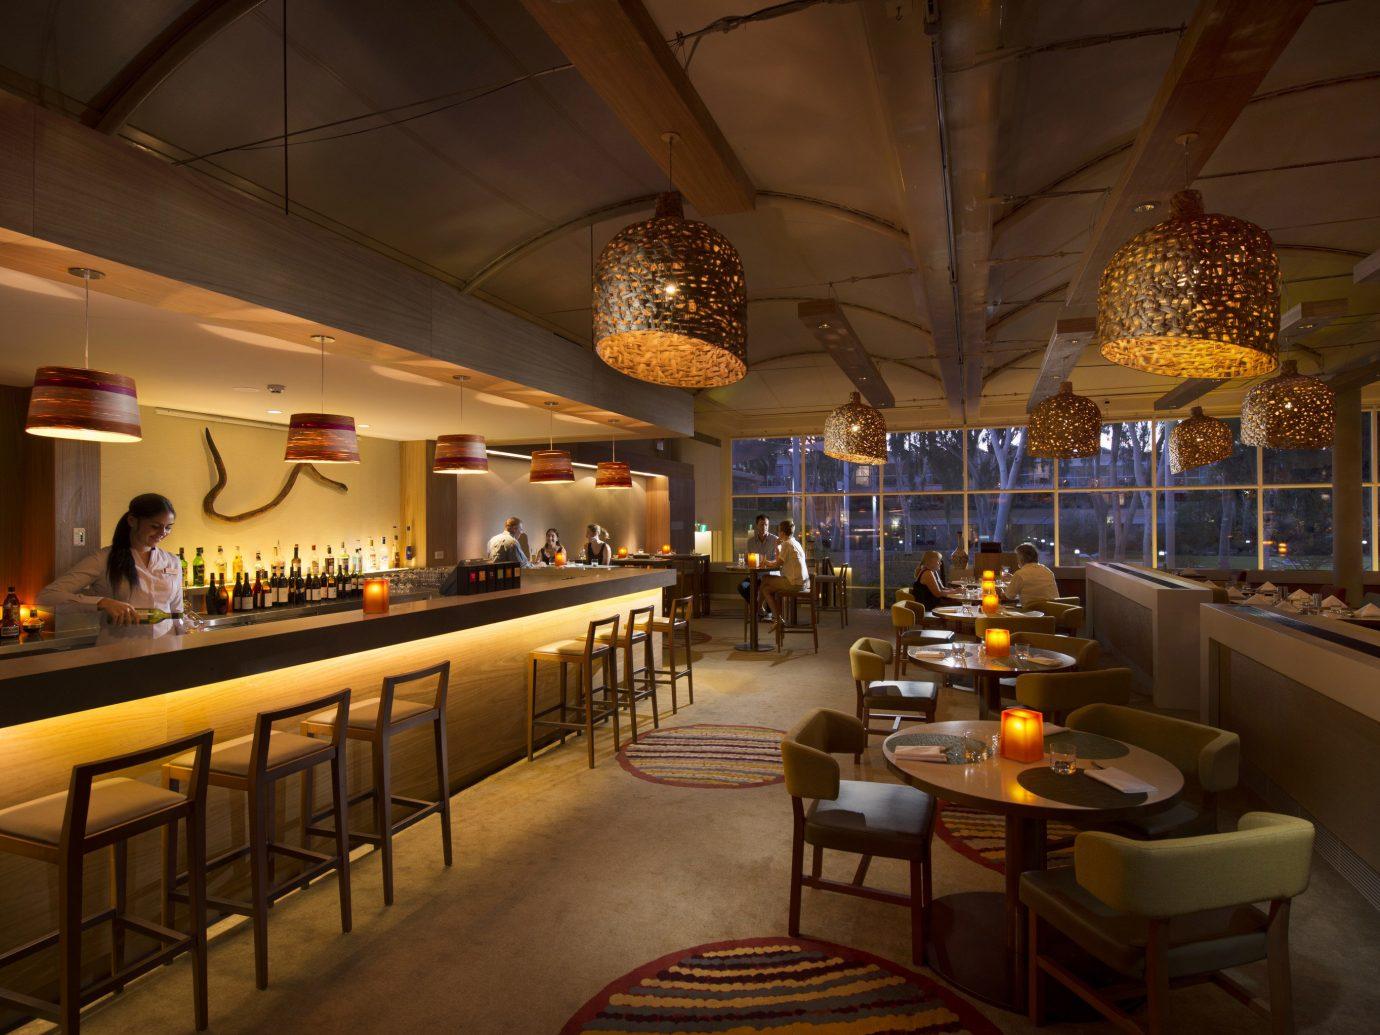 Hotels Offbeat indoor ceiling restaurant interior design function hall Bar several